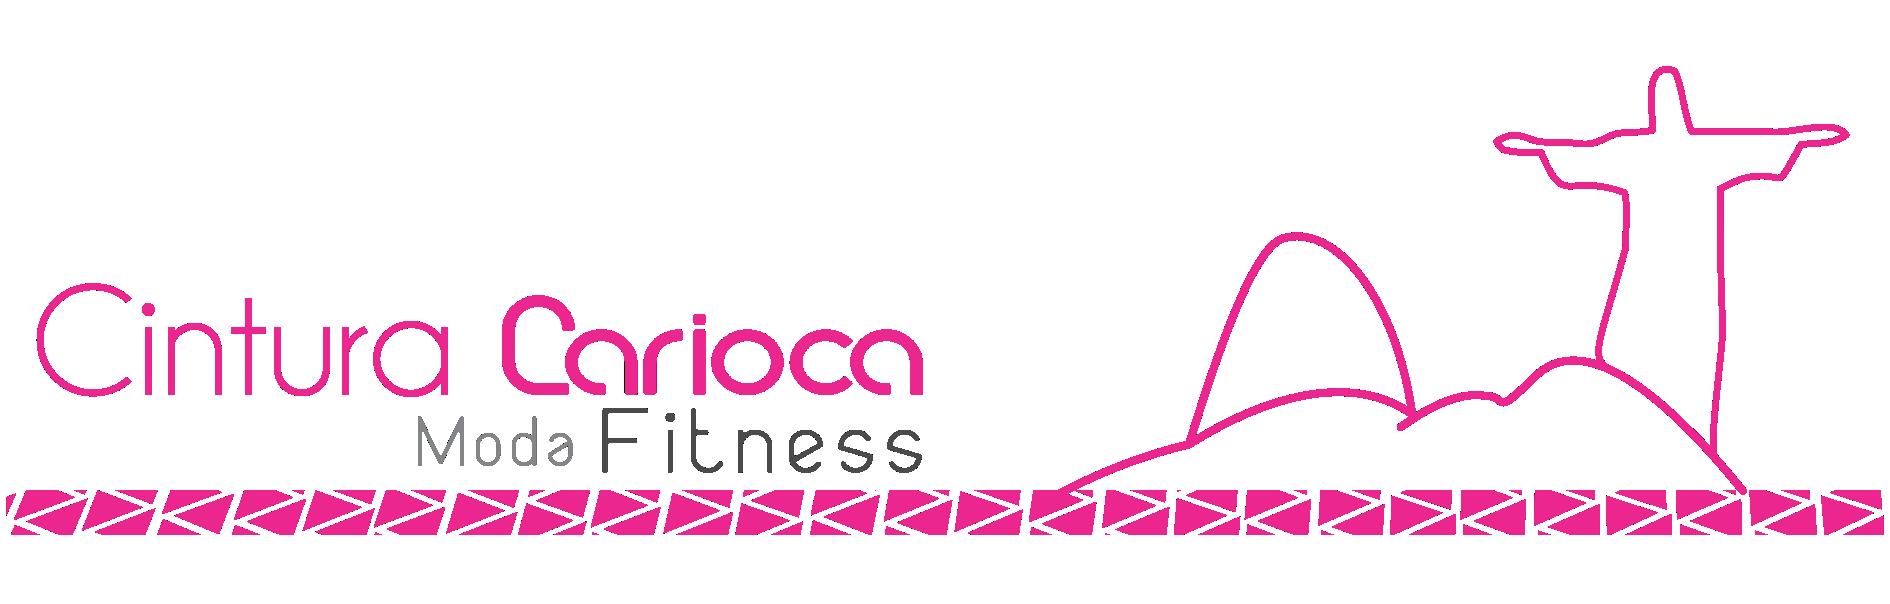 Cintura Carioca Moda Fitness